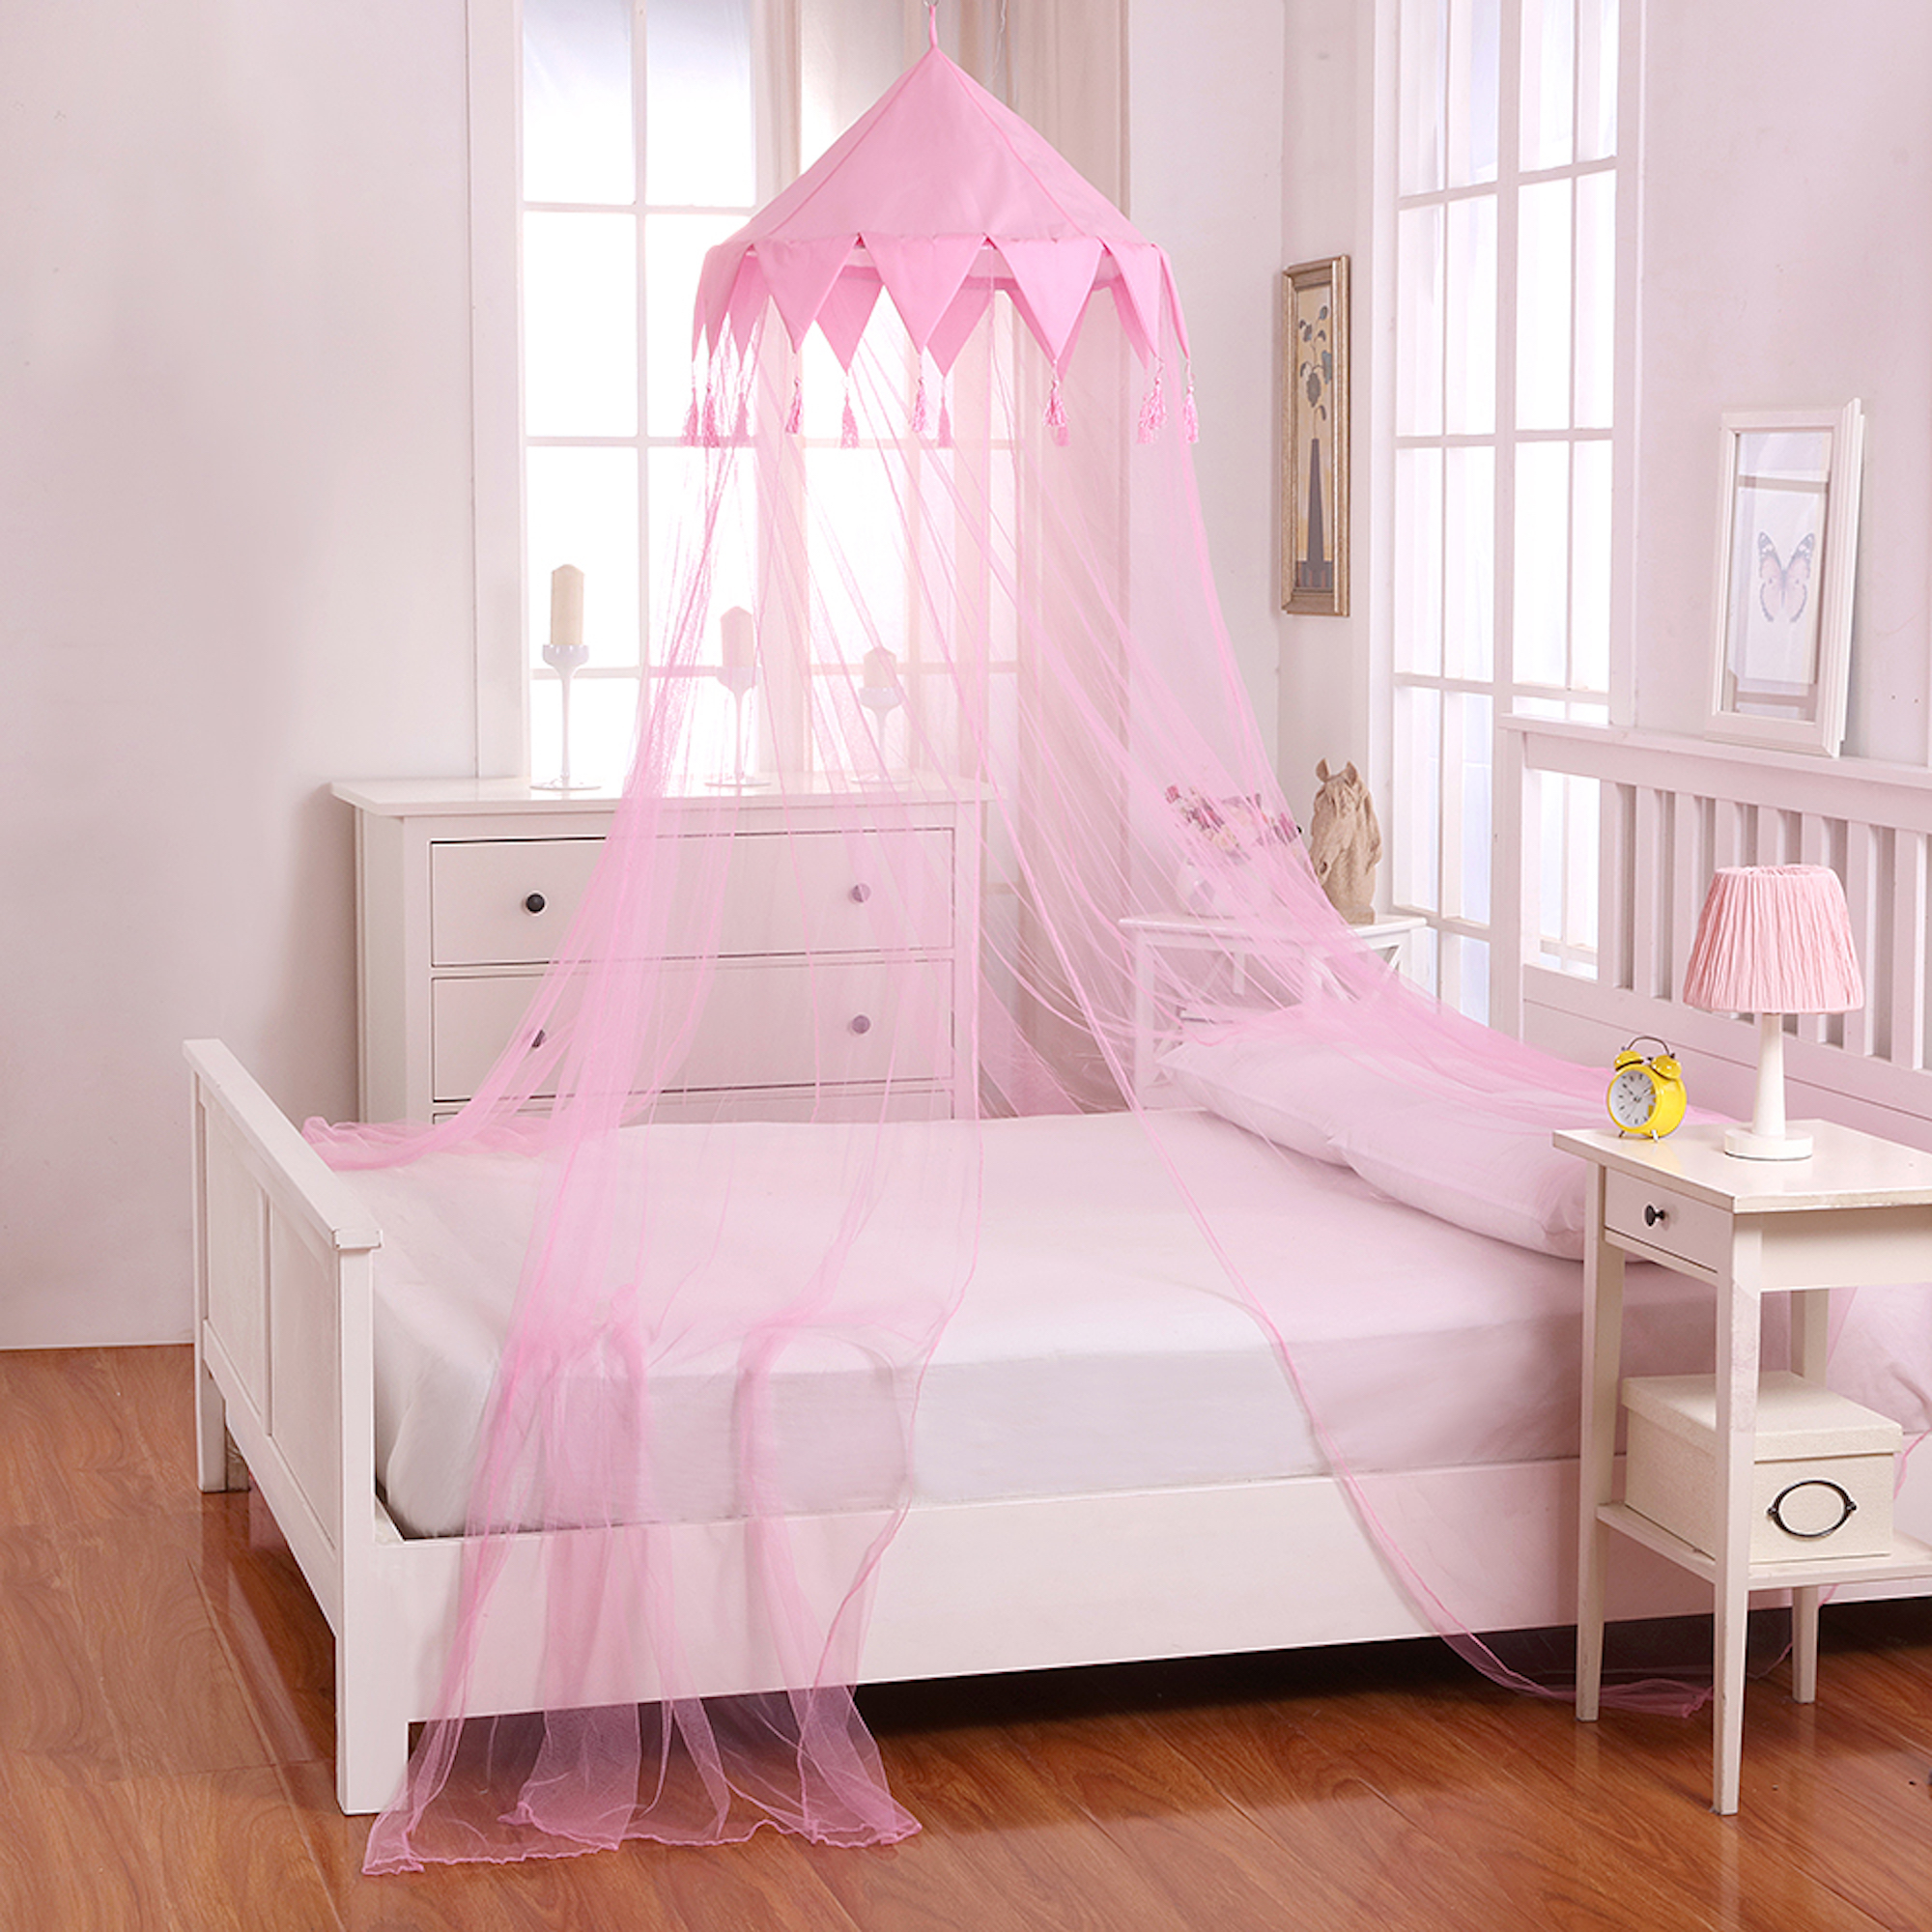 Casablanca Harlequin Collapsible Hoop Sheer Bed Canopy Pink